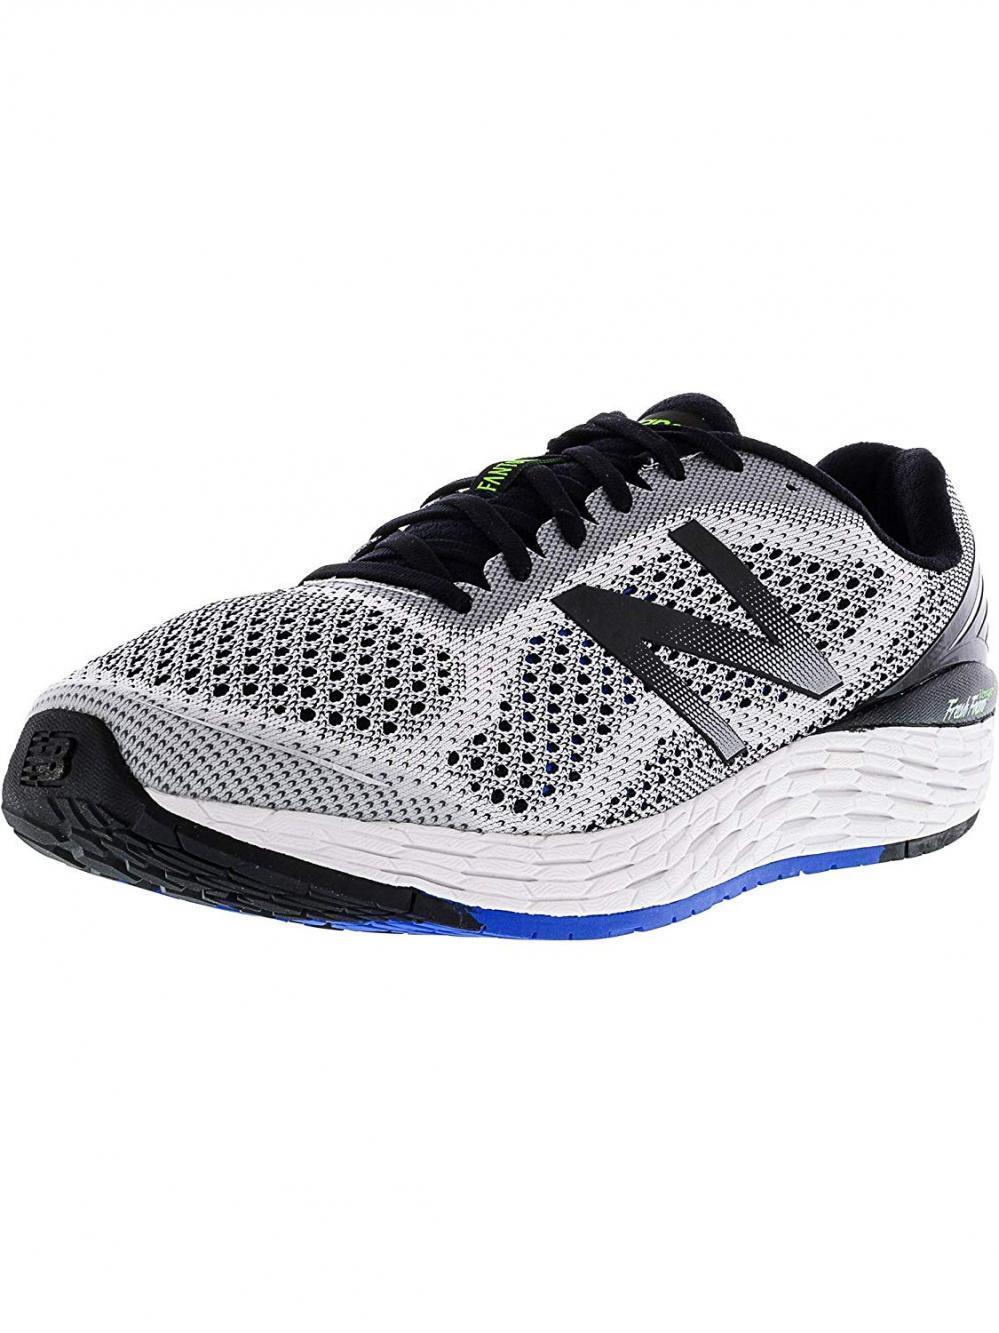 New Balance Men's Vongo V2 Running shoes